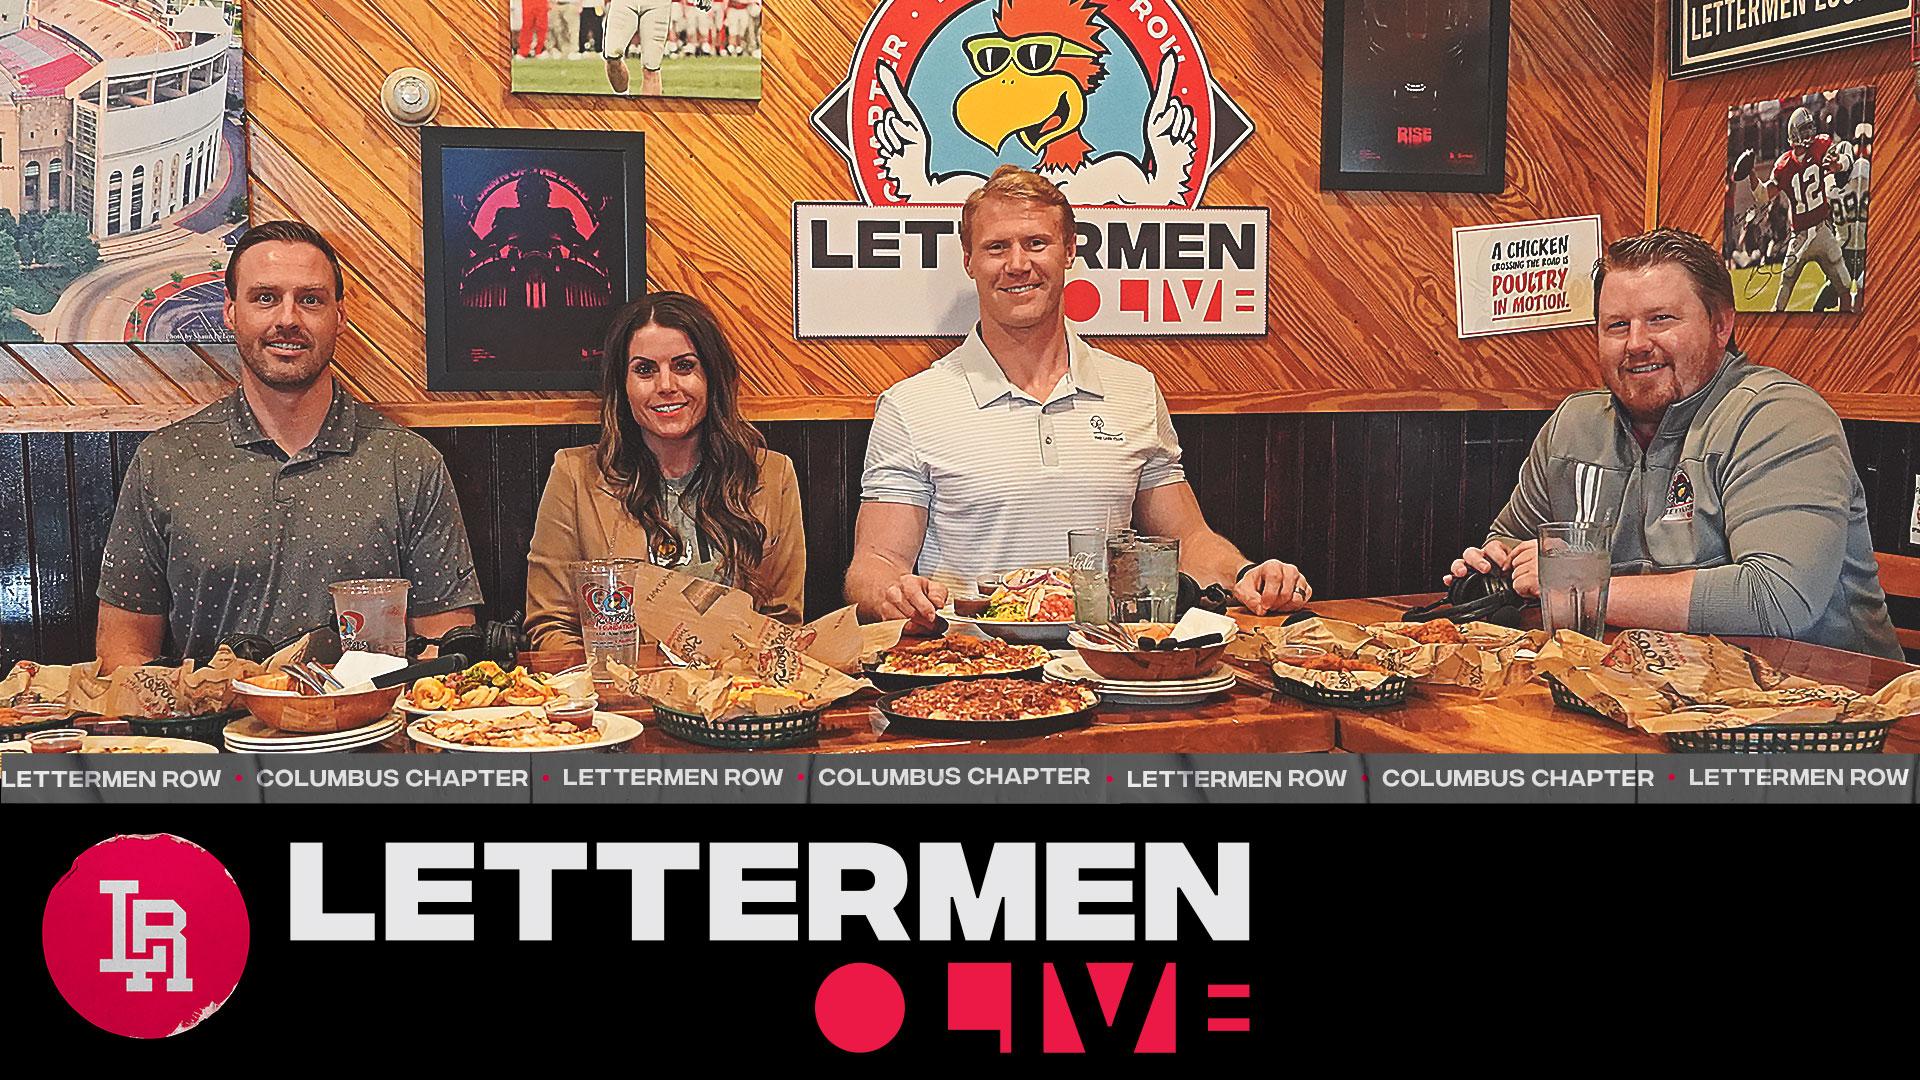 Lettermen-April-5